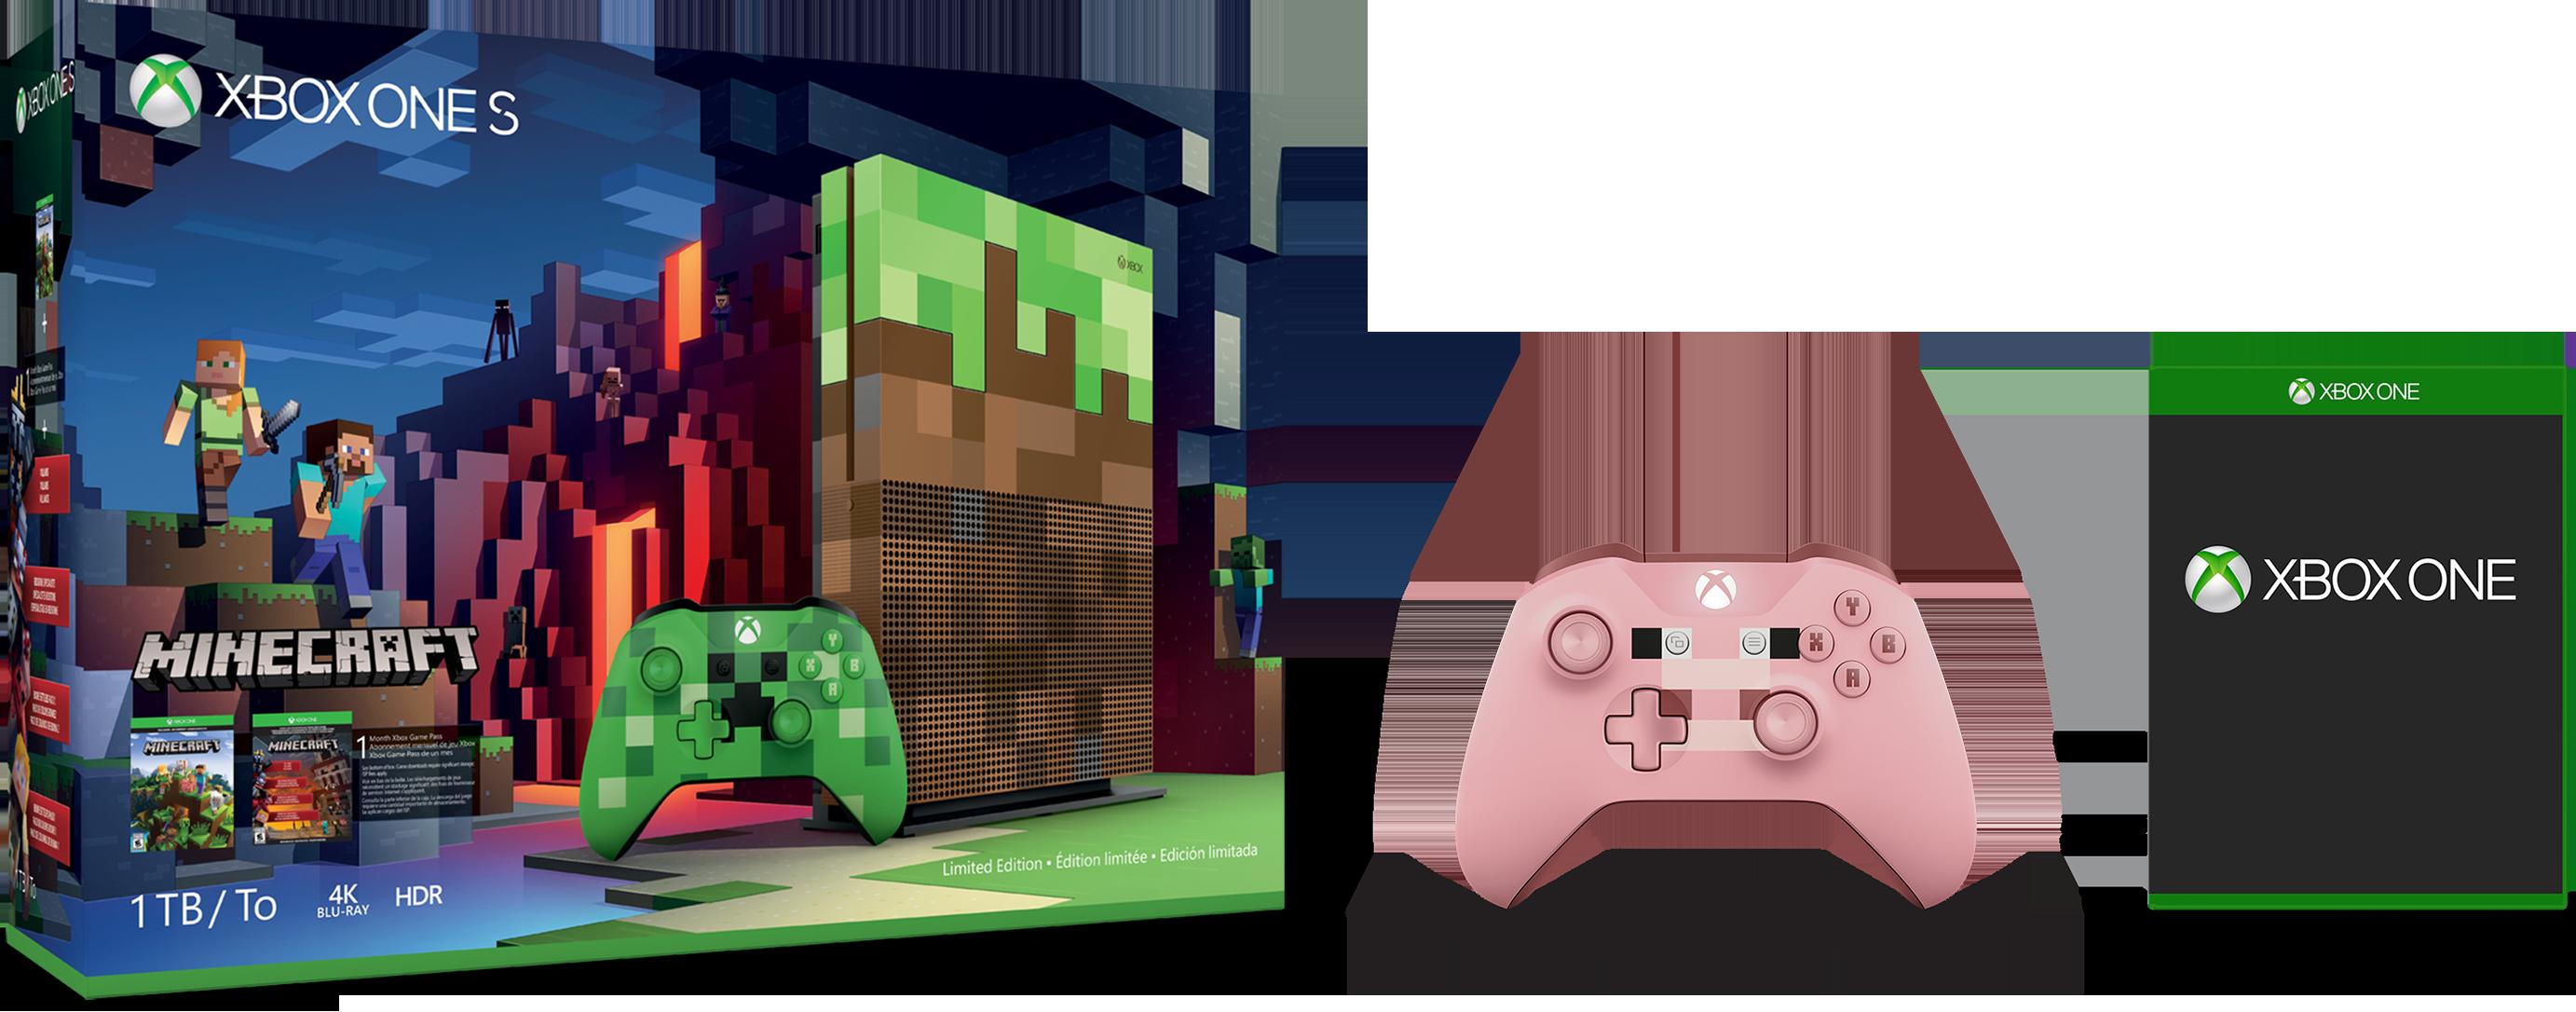 Xbox One S 1 TB Console – Microsoft Rewards Minecraft Family Bundle